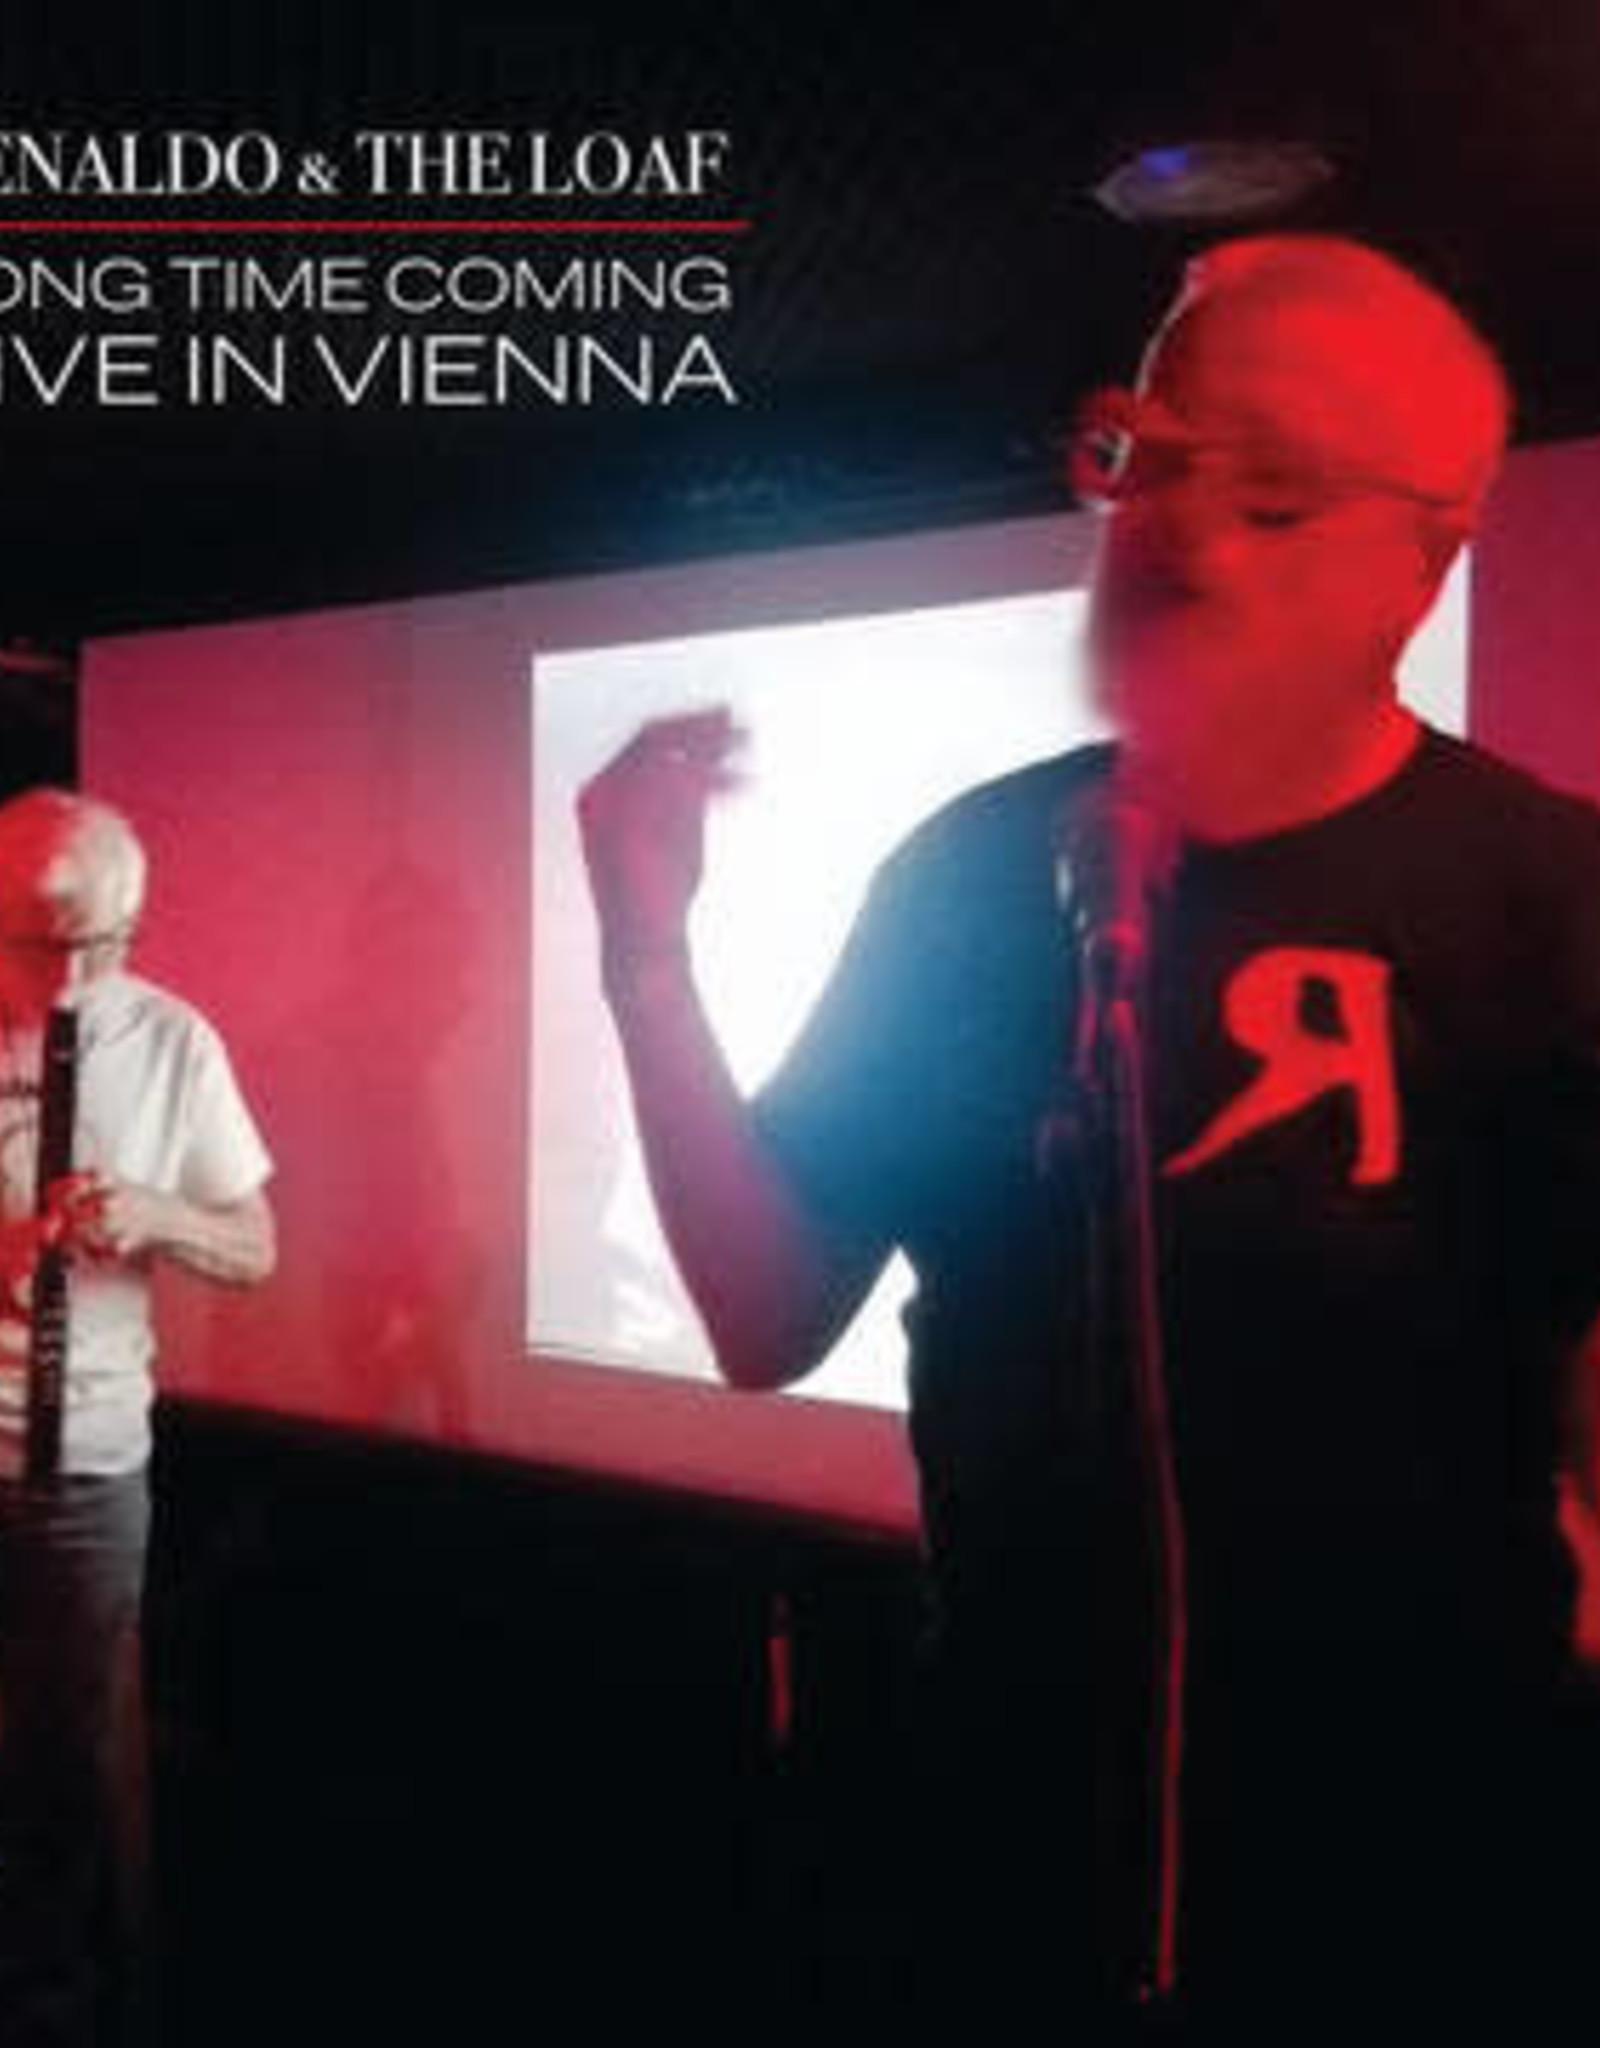 Renaldo & the Loaf - Long Time Coming: Live In Vienna  (Red/Black Splatter & White/Black Splatter Vinyl/2Lp) (RSD 6/21)